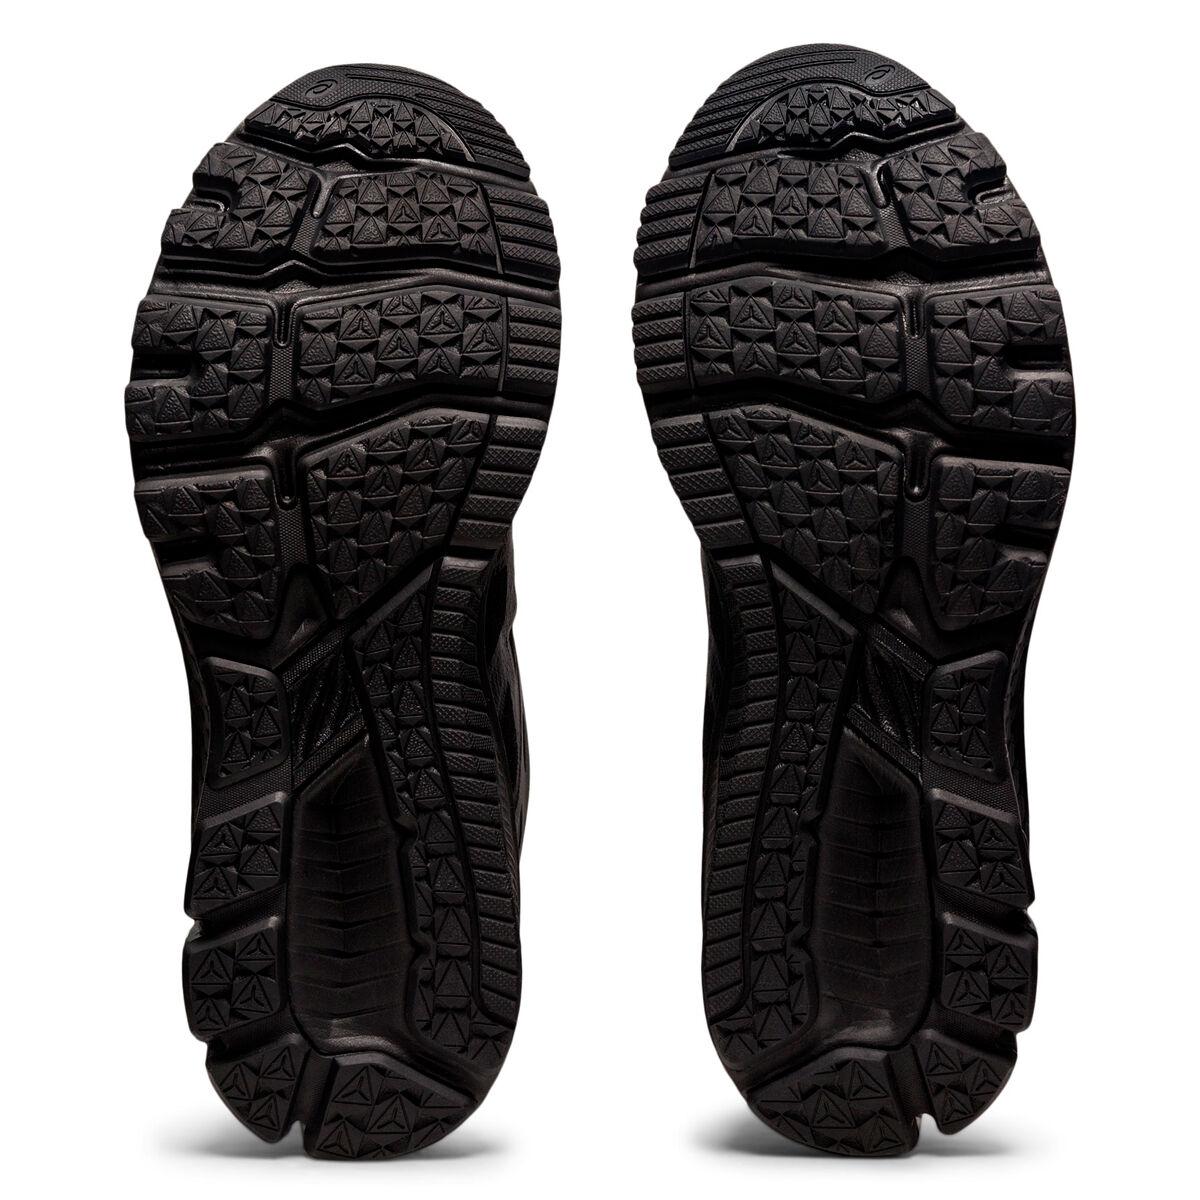 Asics GT 1000 10 Mens Running Shoes